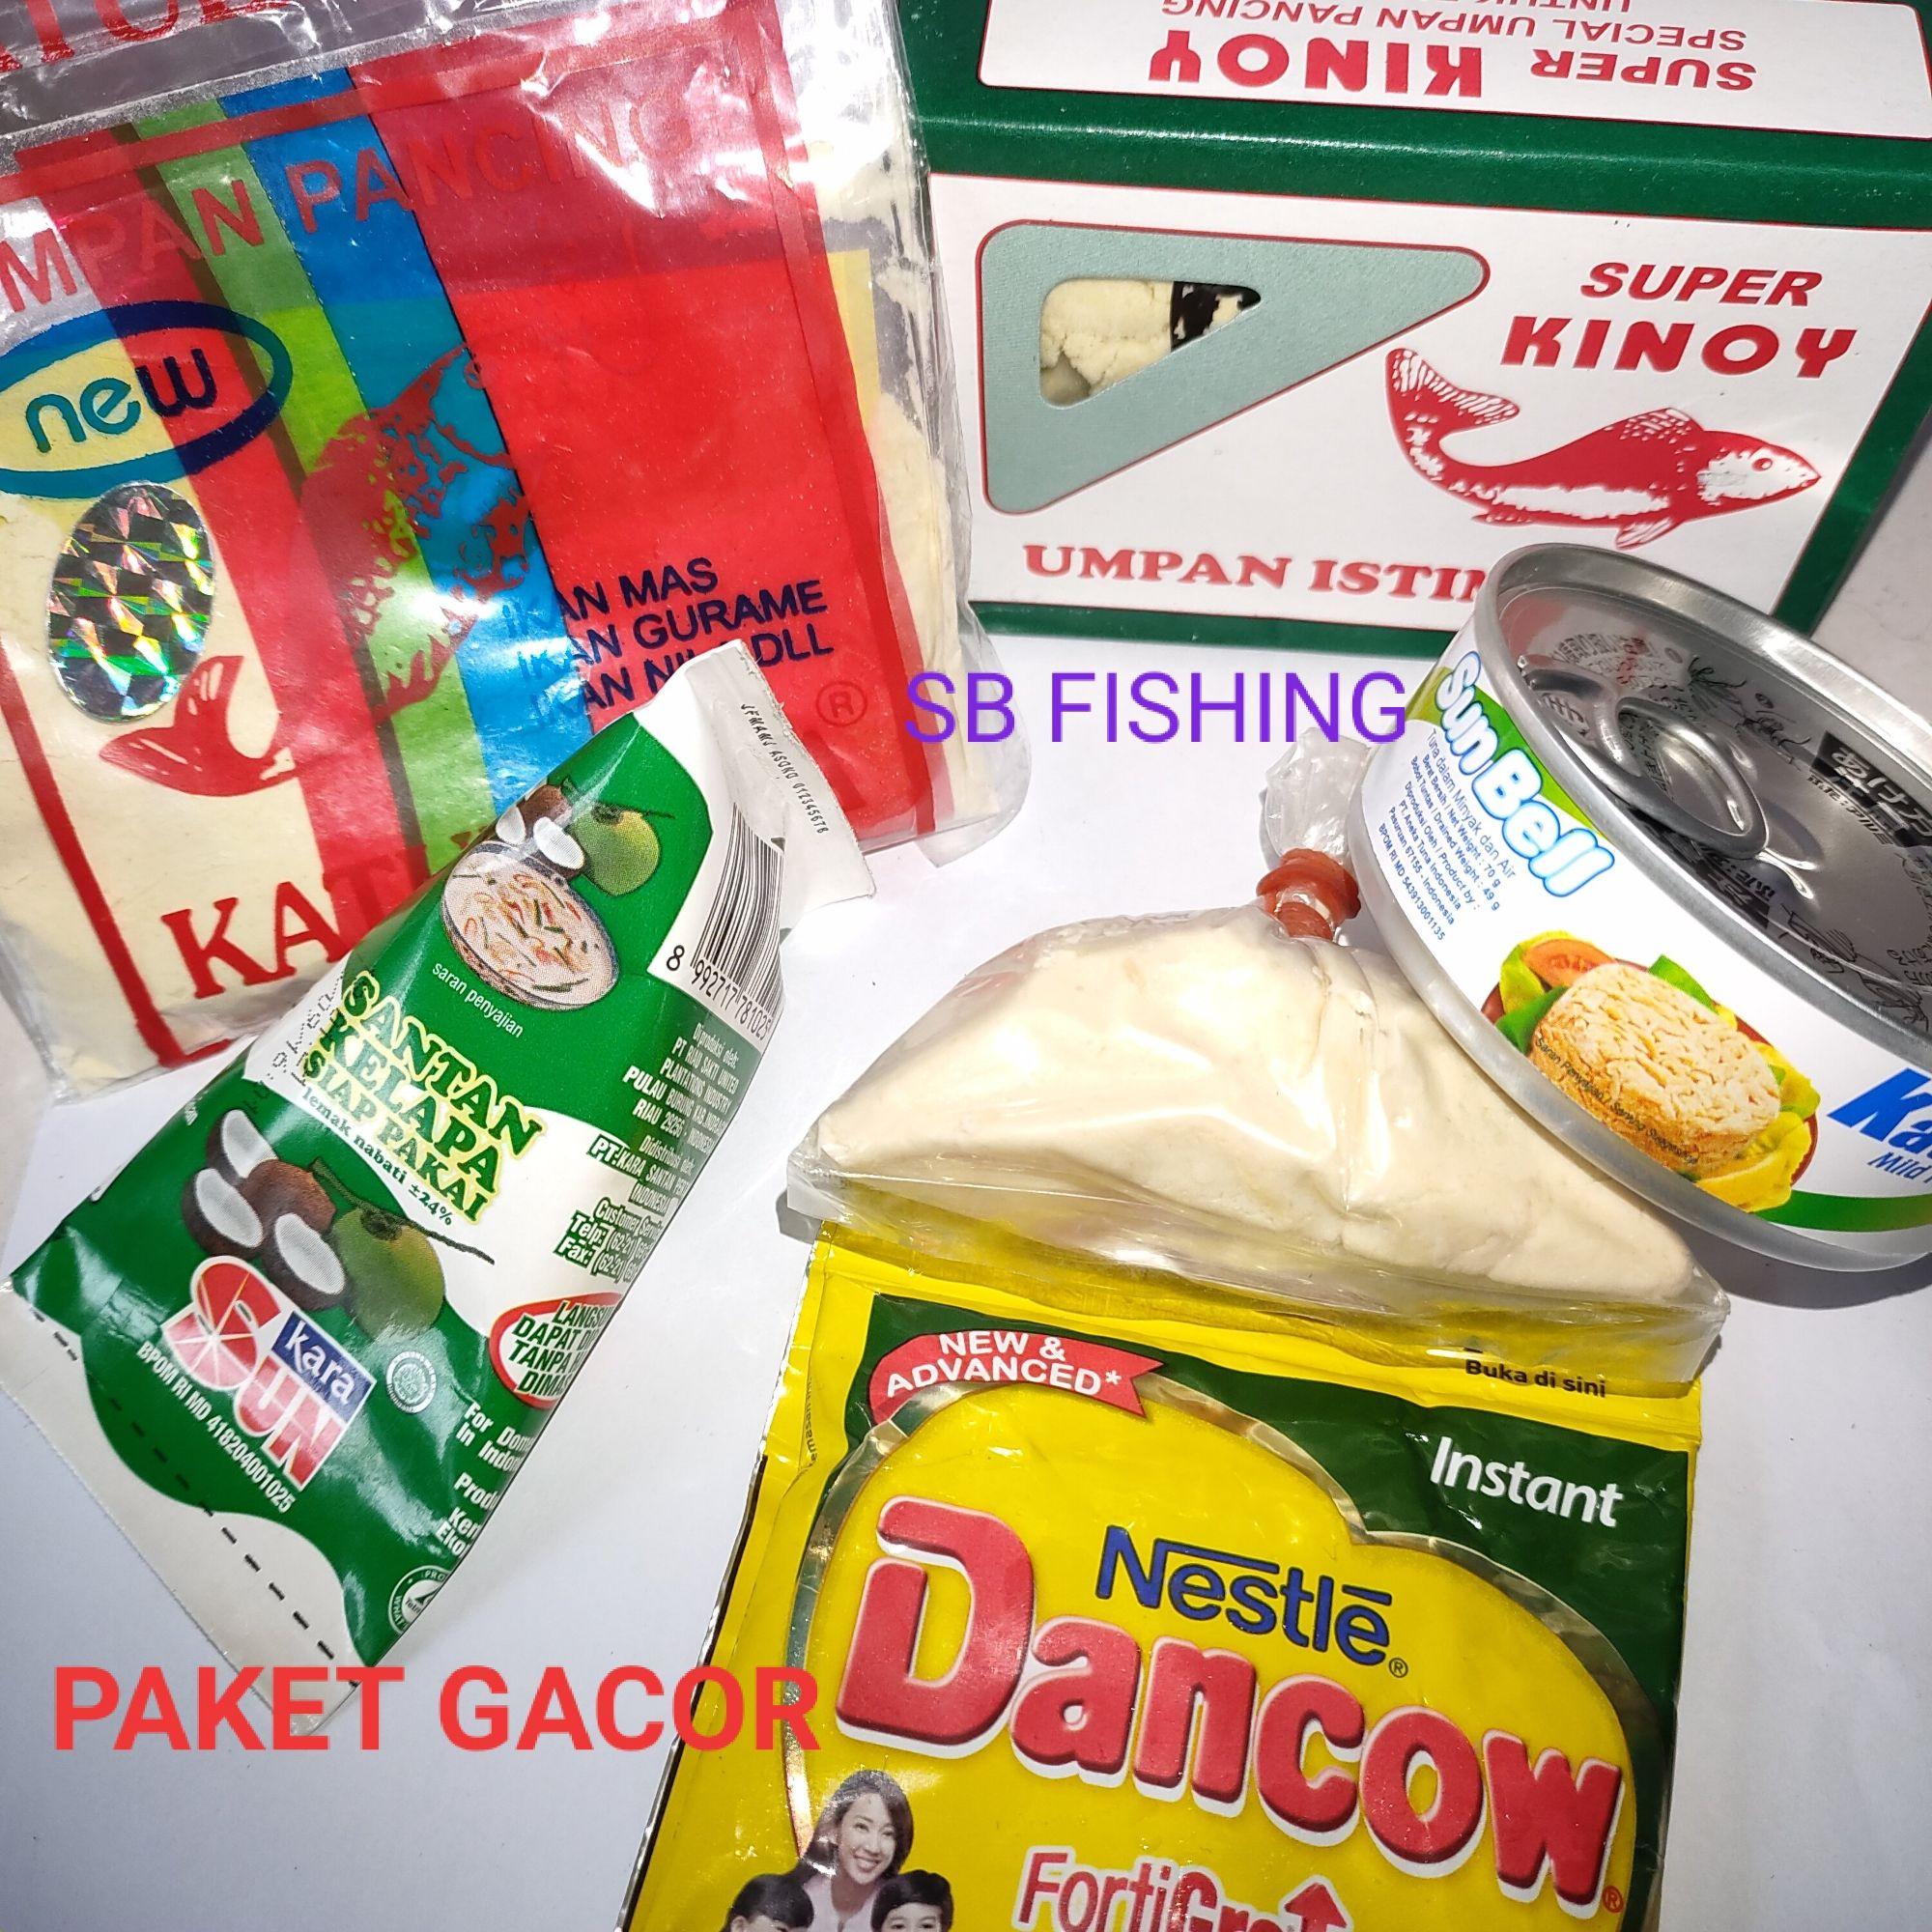 Umpan Ikan Mas Paket Katulampa Sunbell Dancaw Paikin Kara Kinoy Kotak Umpan Pancing Ikan Mas Kukus Resep Umpan Ikan Mas Juara Lazada Indonesia